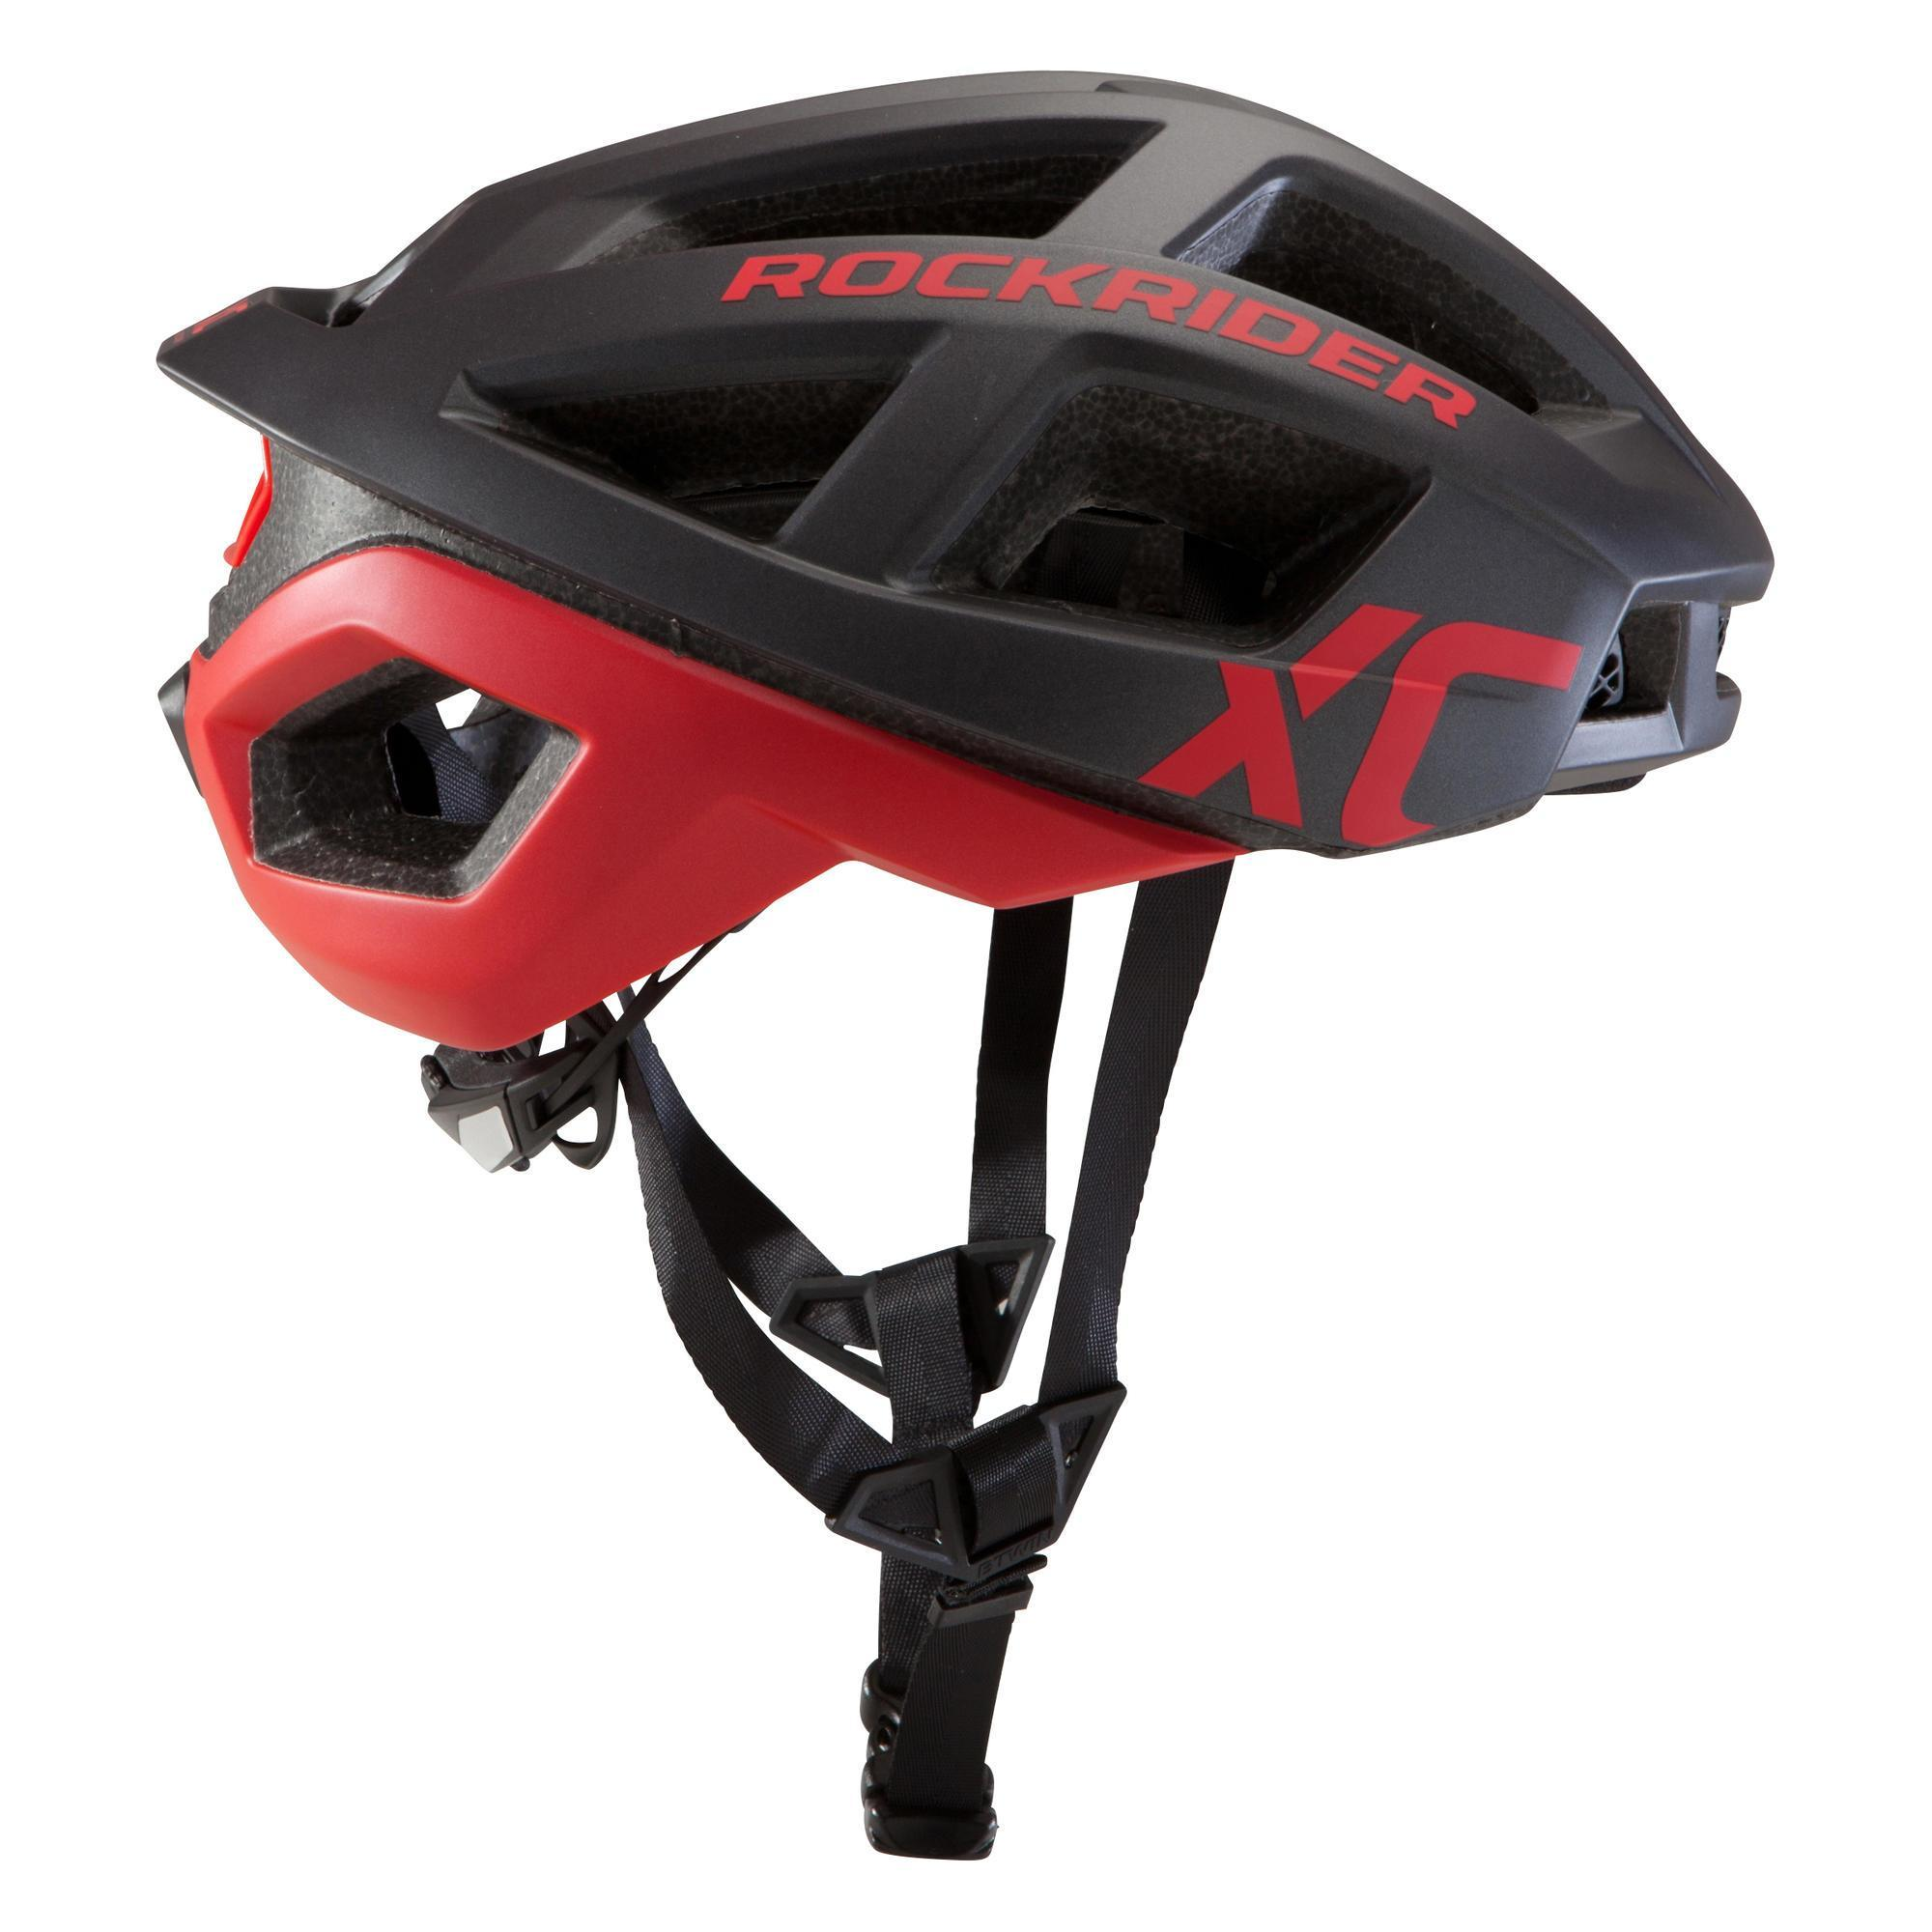 Rockrider MTB-helm XC rood kopen